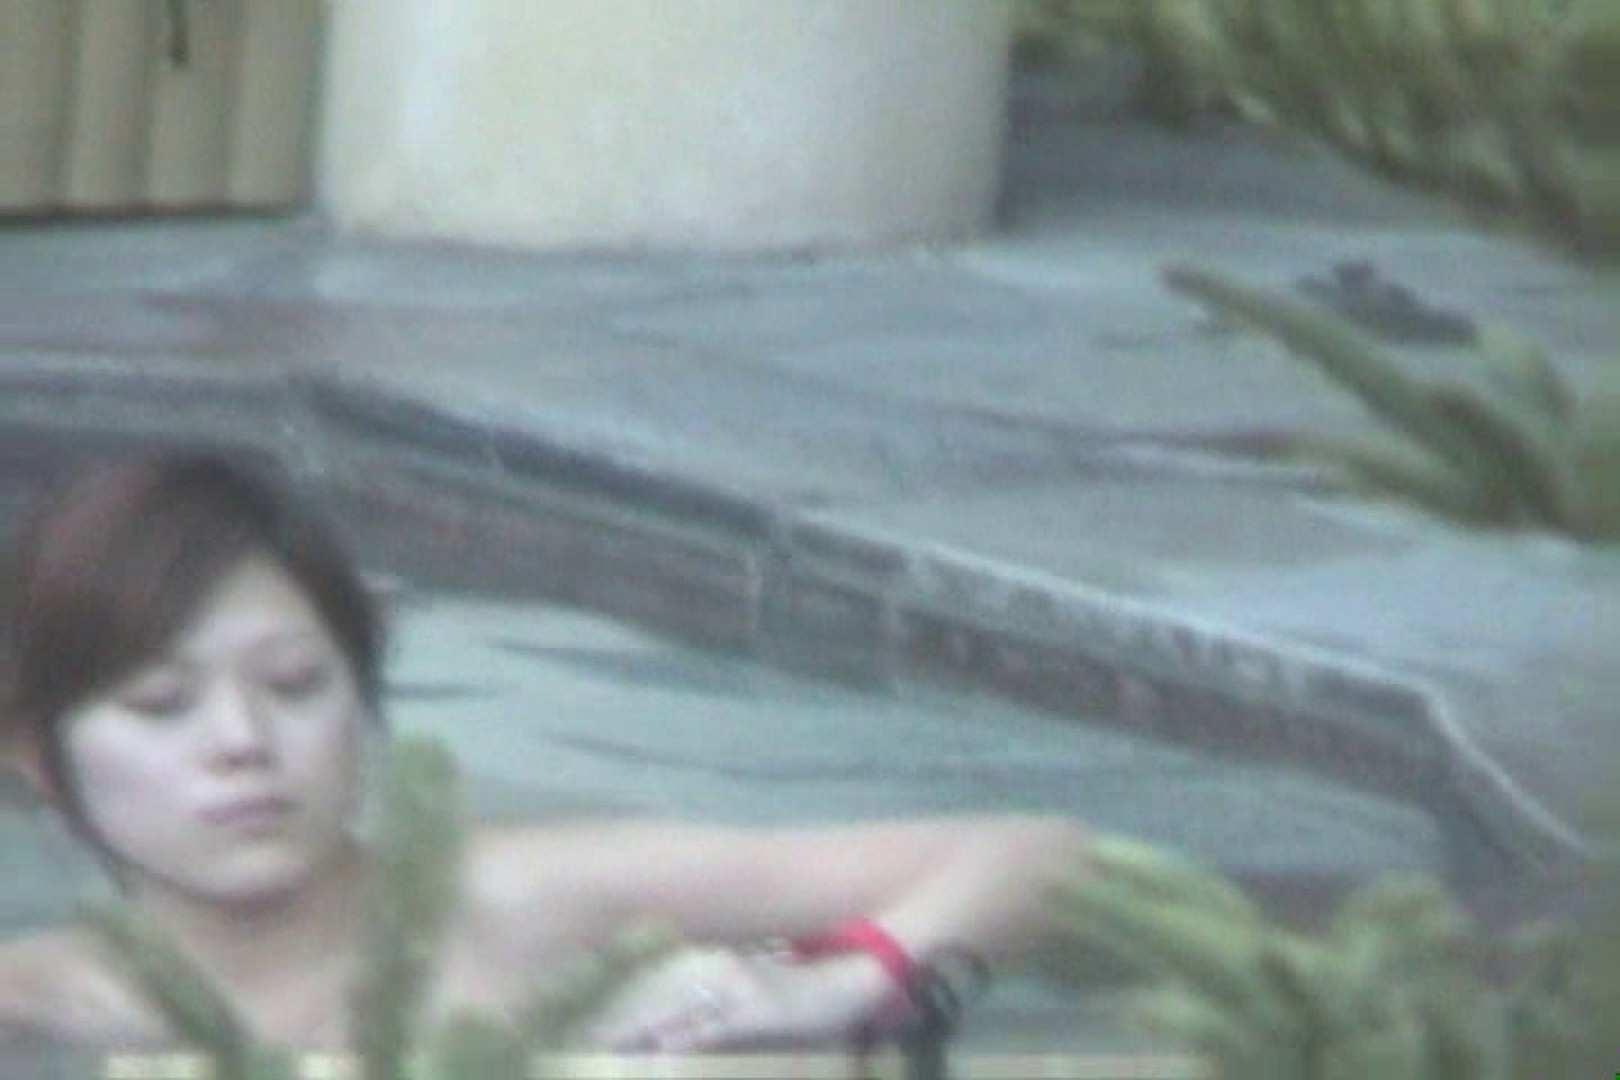 Aquaな露天風呂Vol.609 OLのプライベート | 盗撮特撮  11pic 7